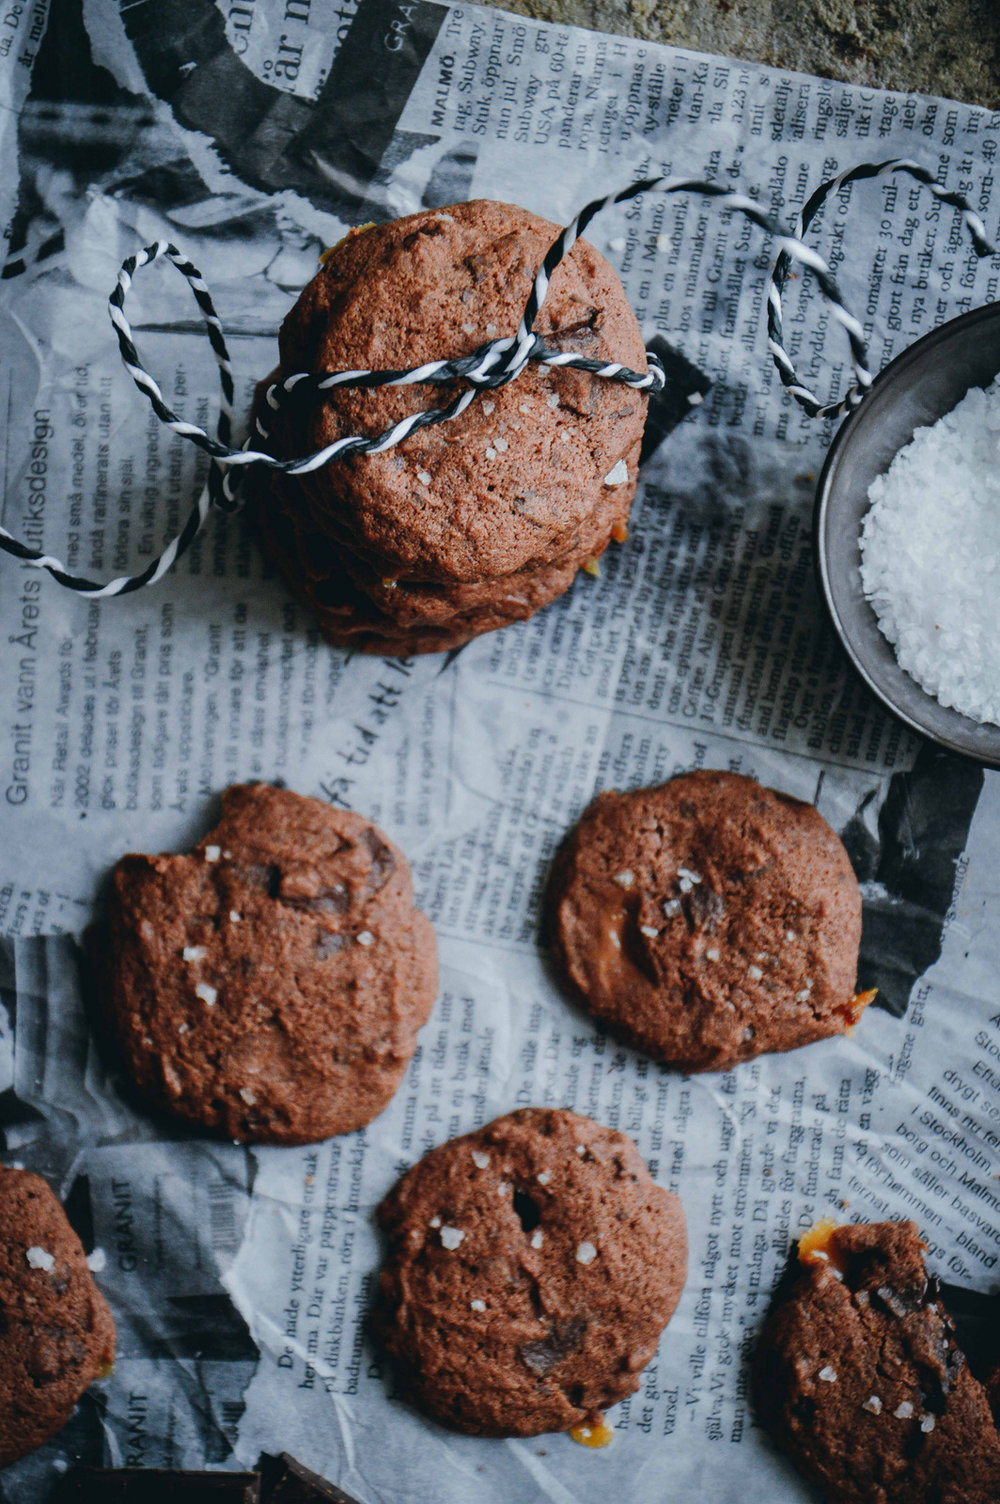 Glutenfree chocolate chip cookies | The Nordic Kitchen